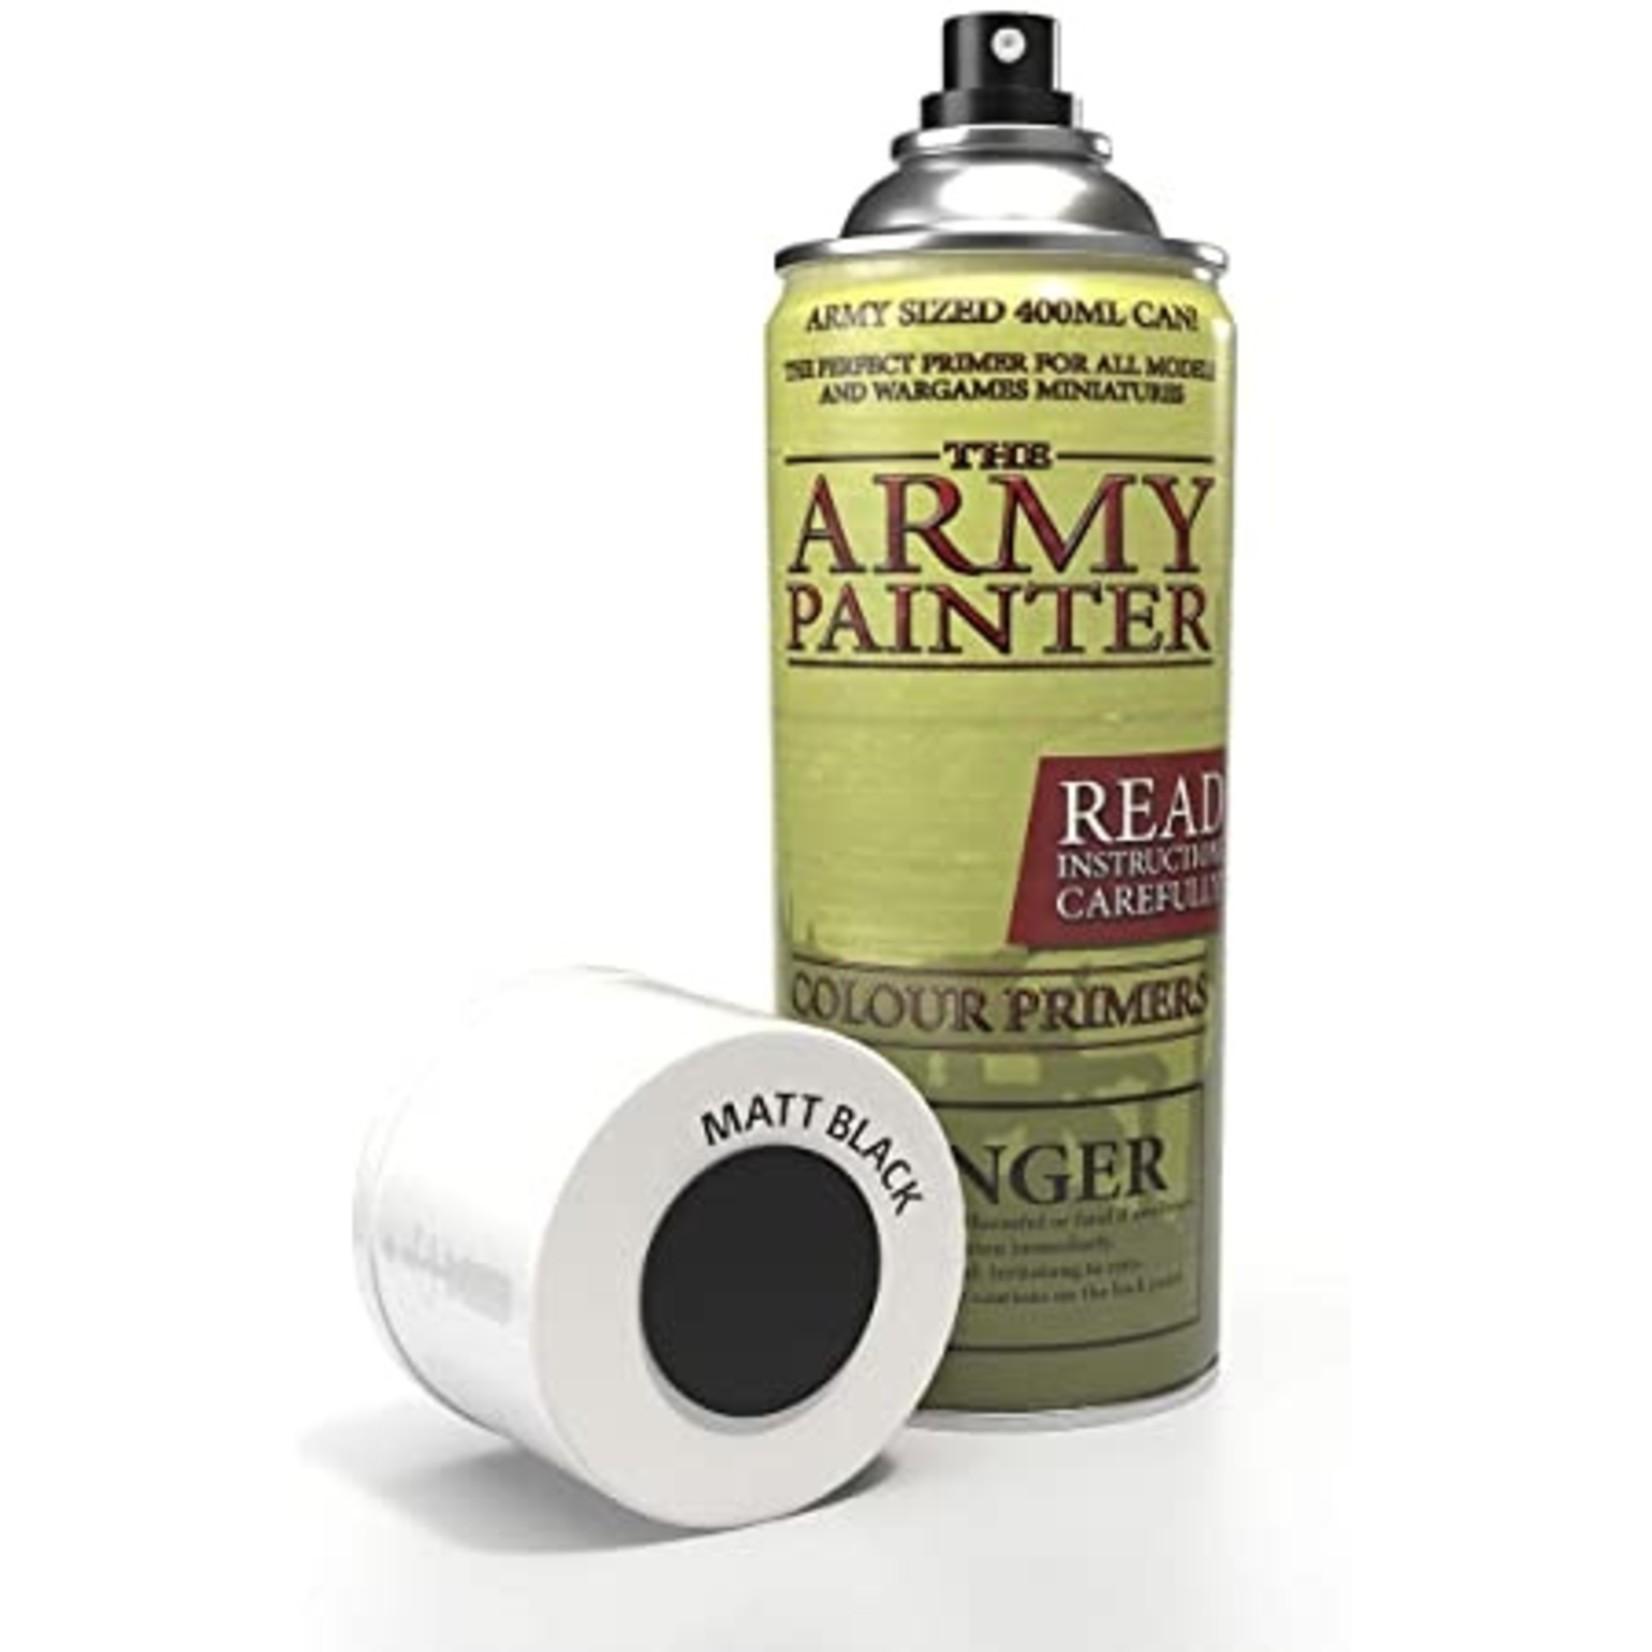 Army Painter: Base Primer Matte Black